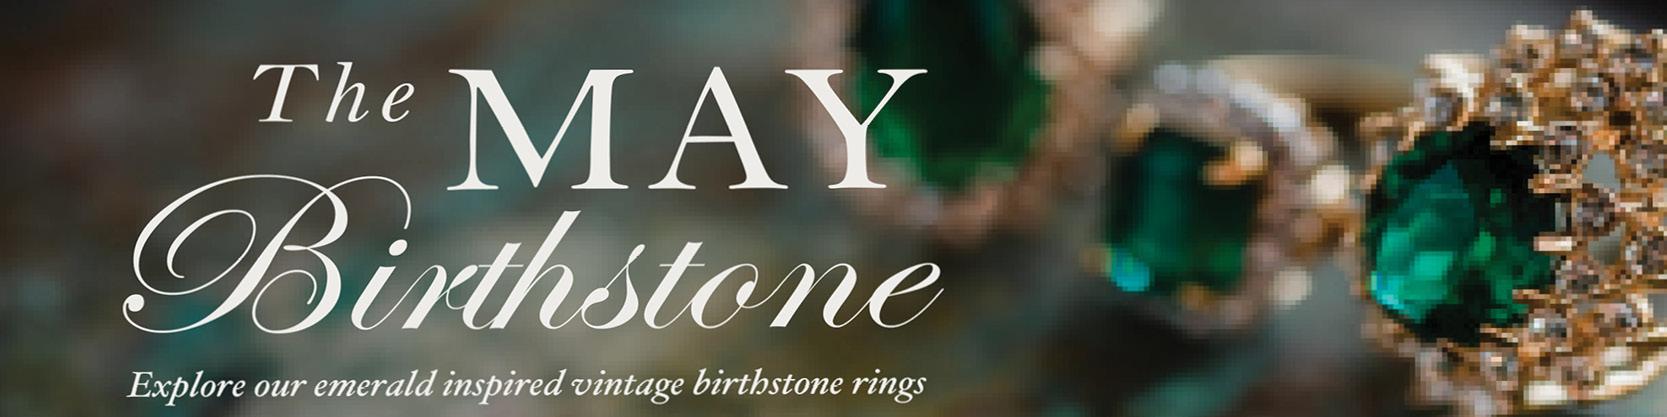 May birthstone vintage emerald ring - cubic zirconia - clear Swarovski crystals